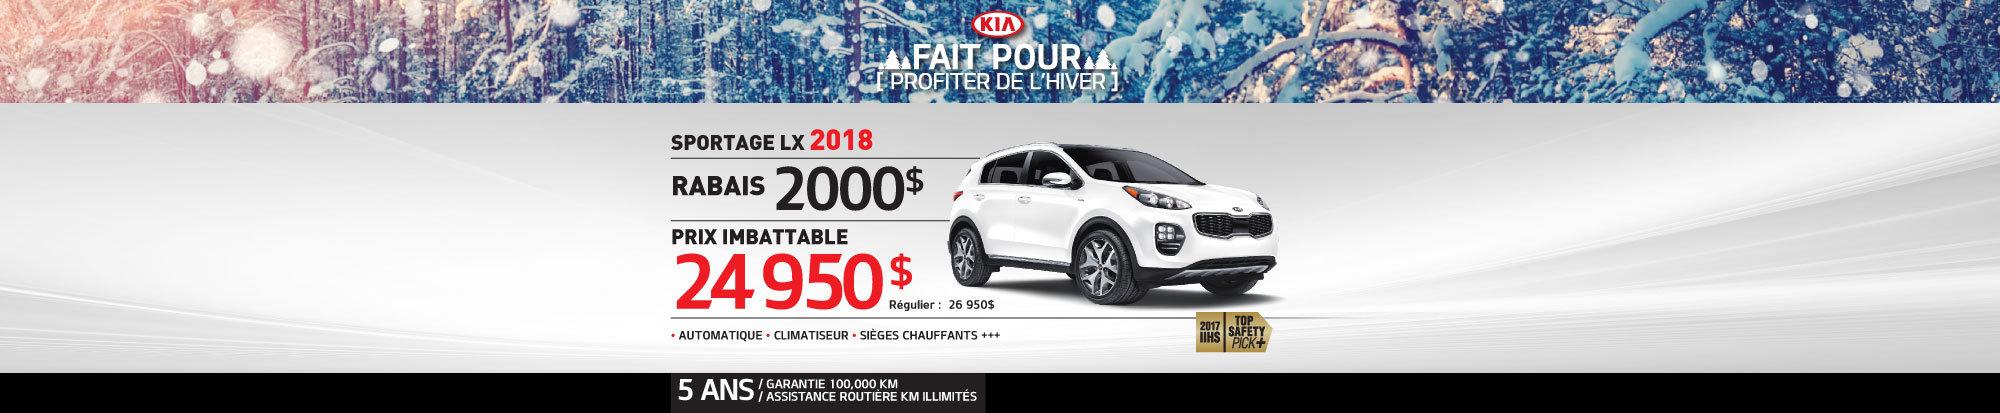 Sportage LX 2018 web